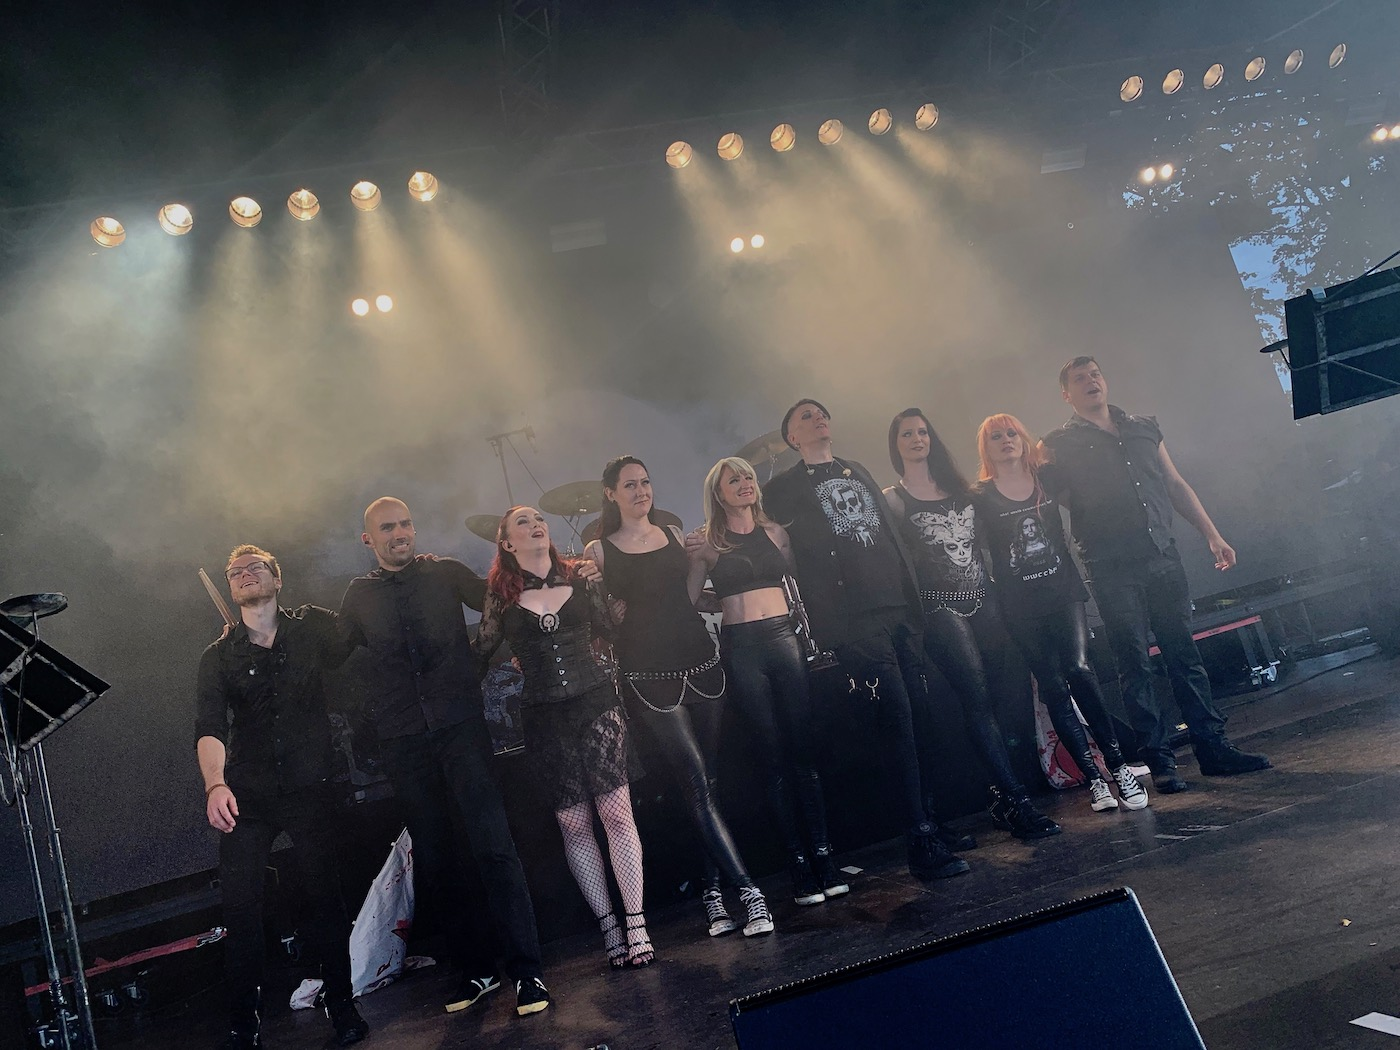 mark_benecke_amphi_festival_koeln_2019 - 112.jpg